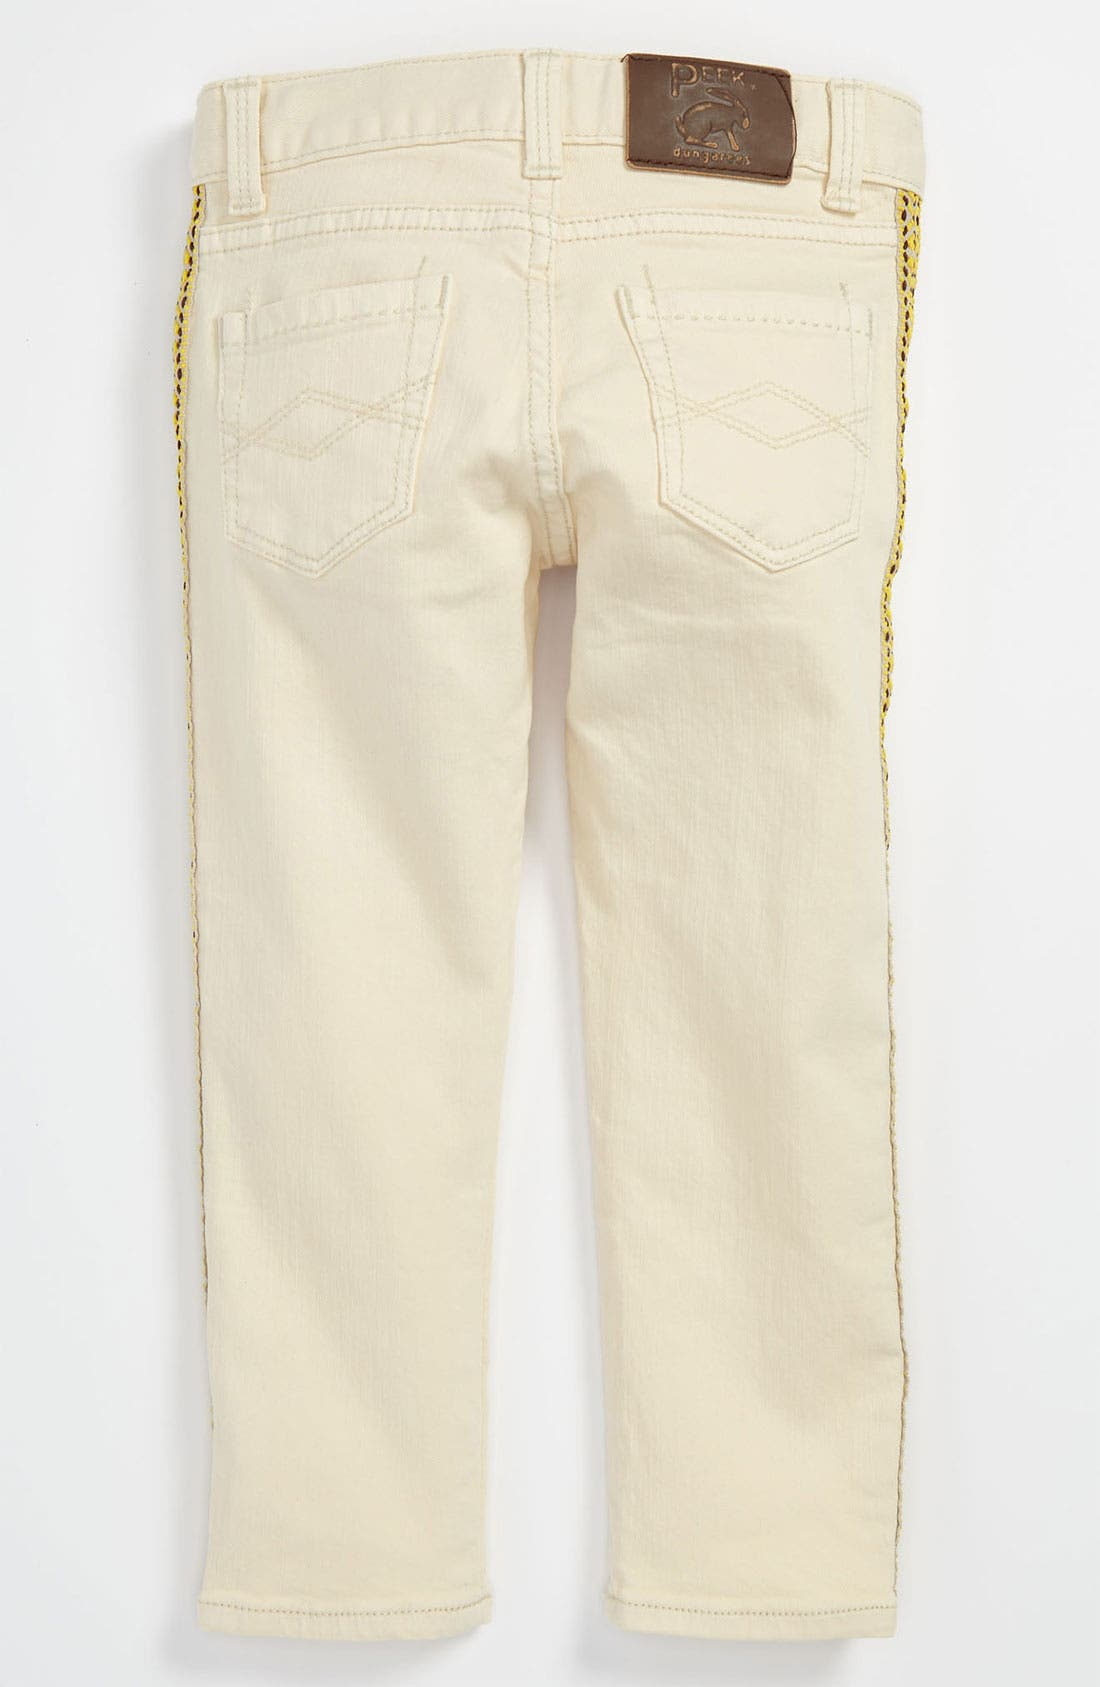 Main Image - Peek 'Nicole' Jeans (Toddler, Little Girls & Big Girls)